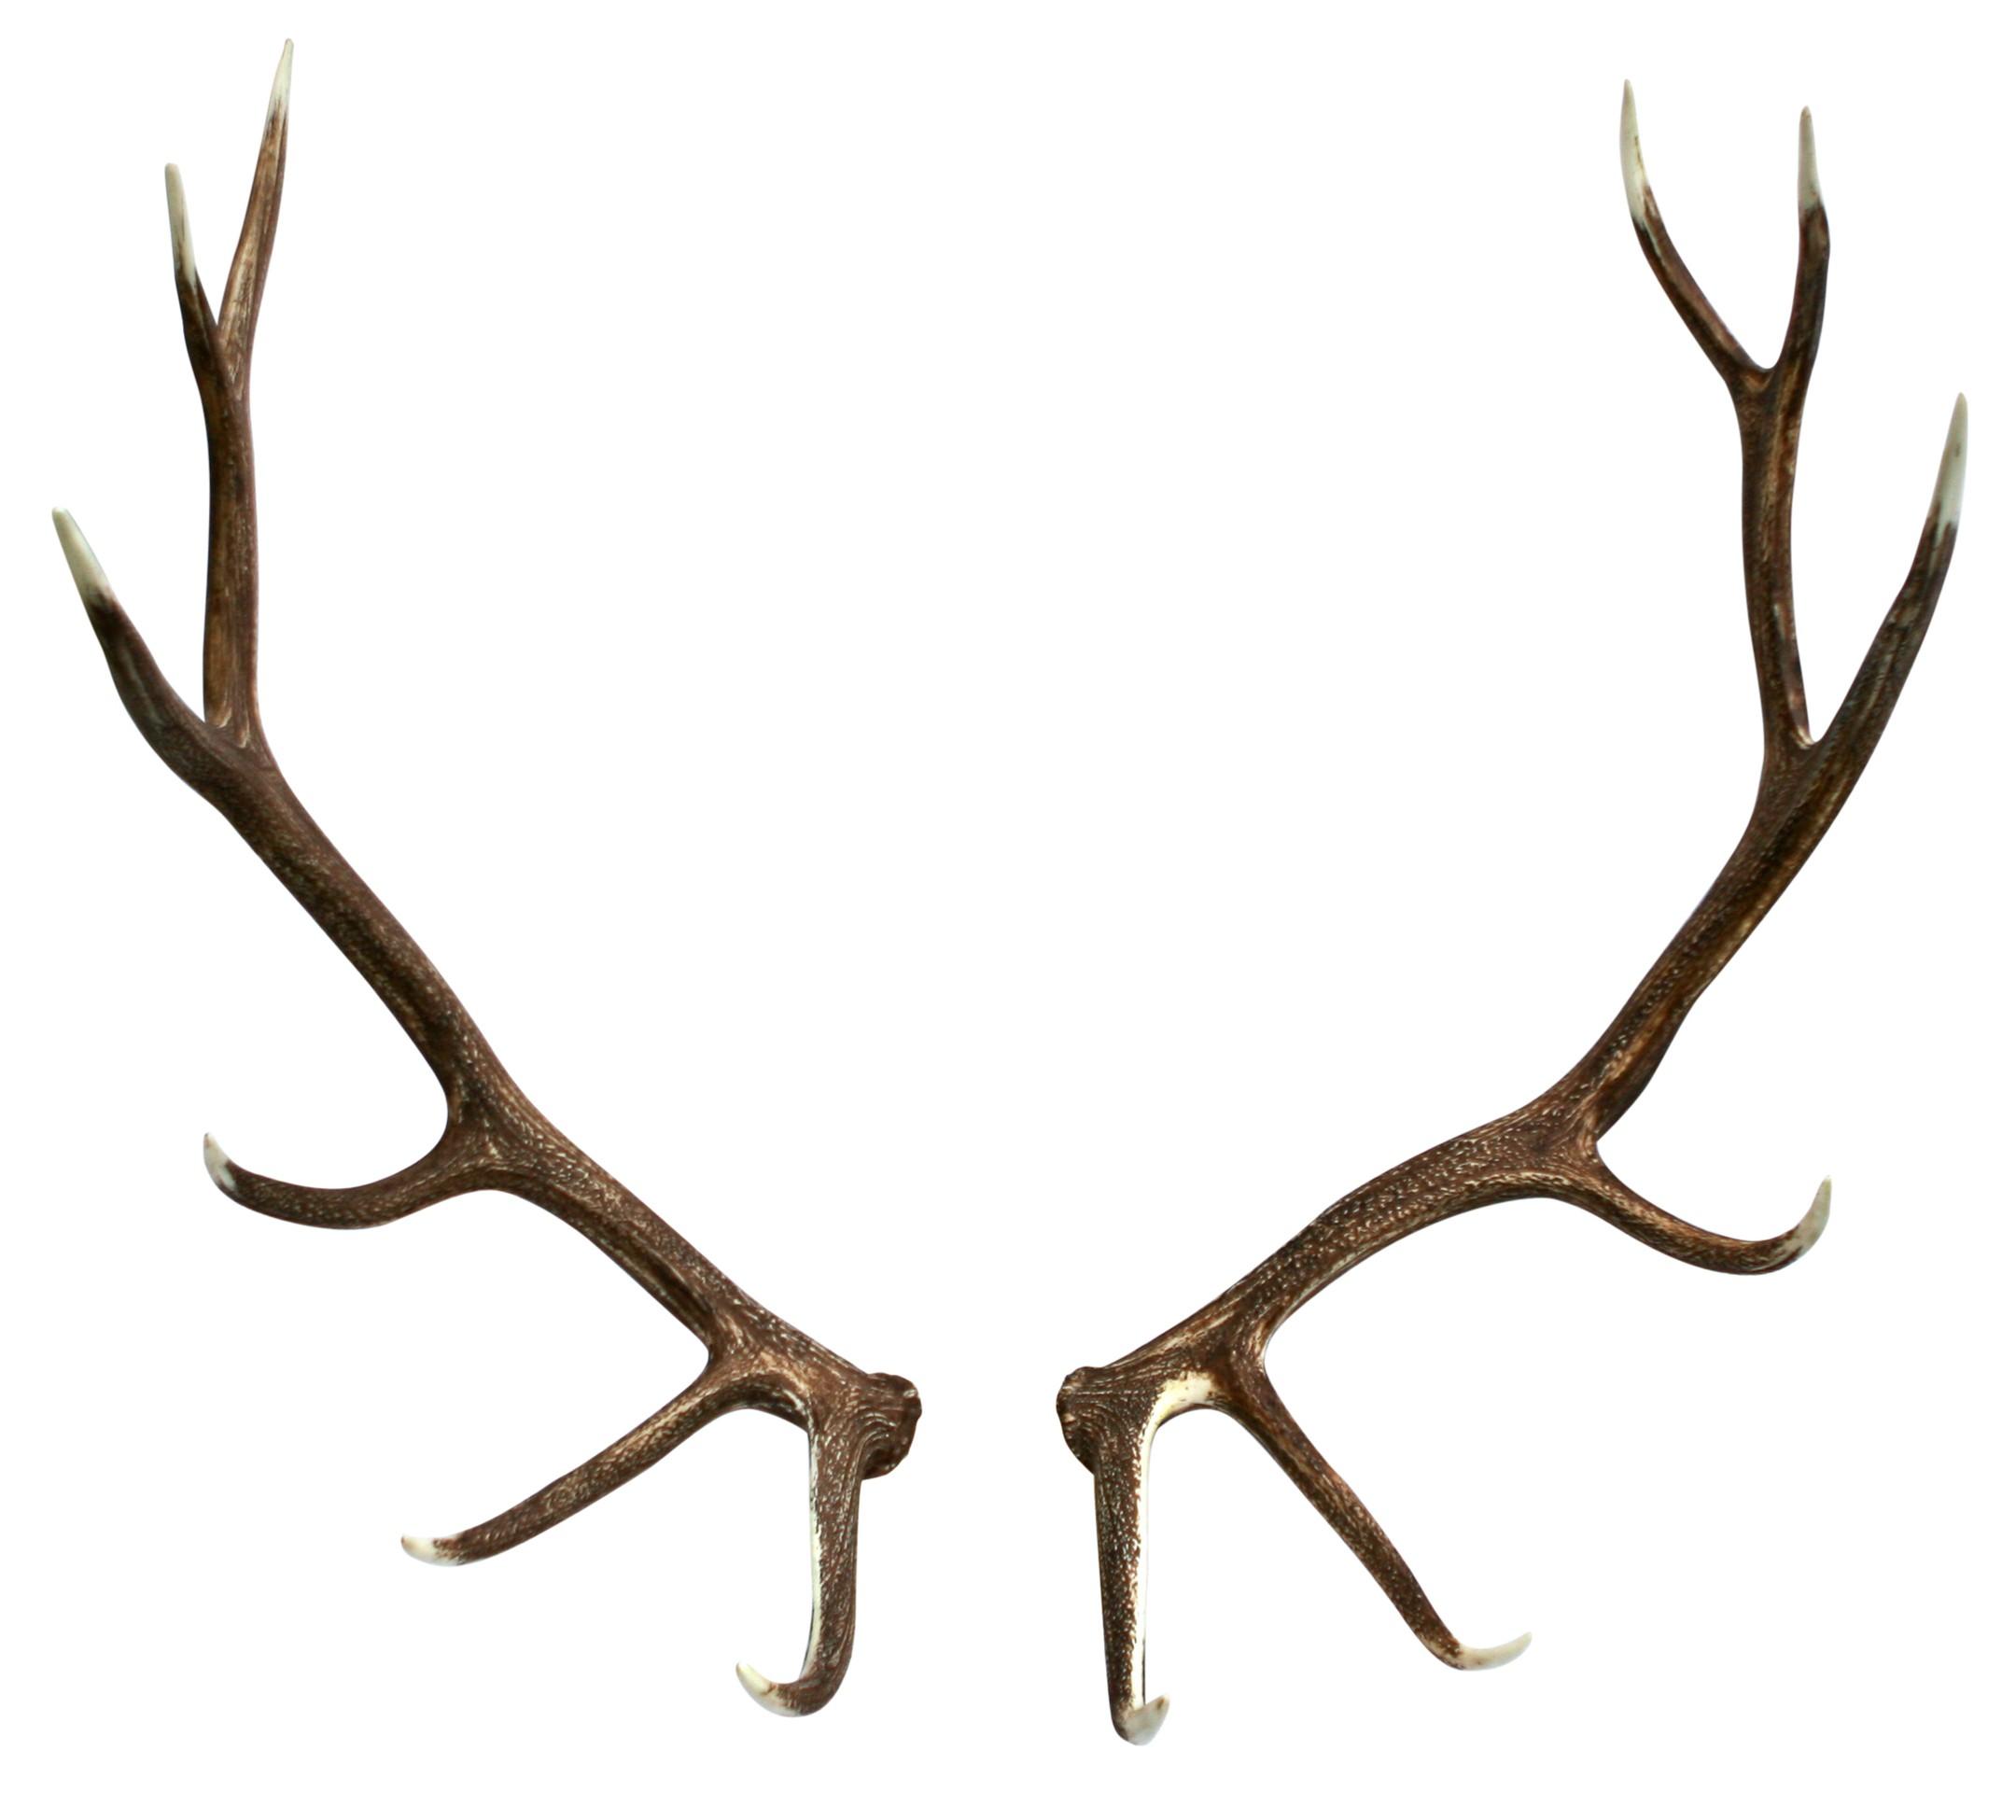 Antlers clip art library. Antler clipart elk